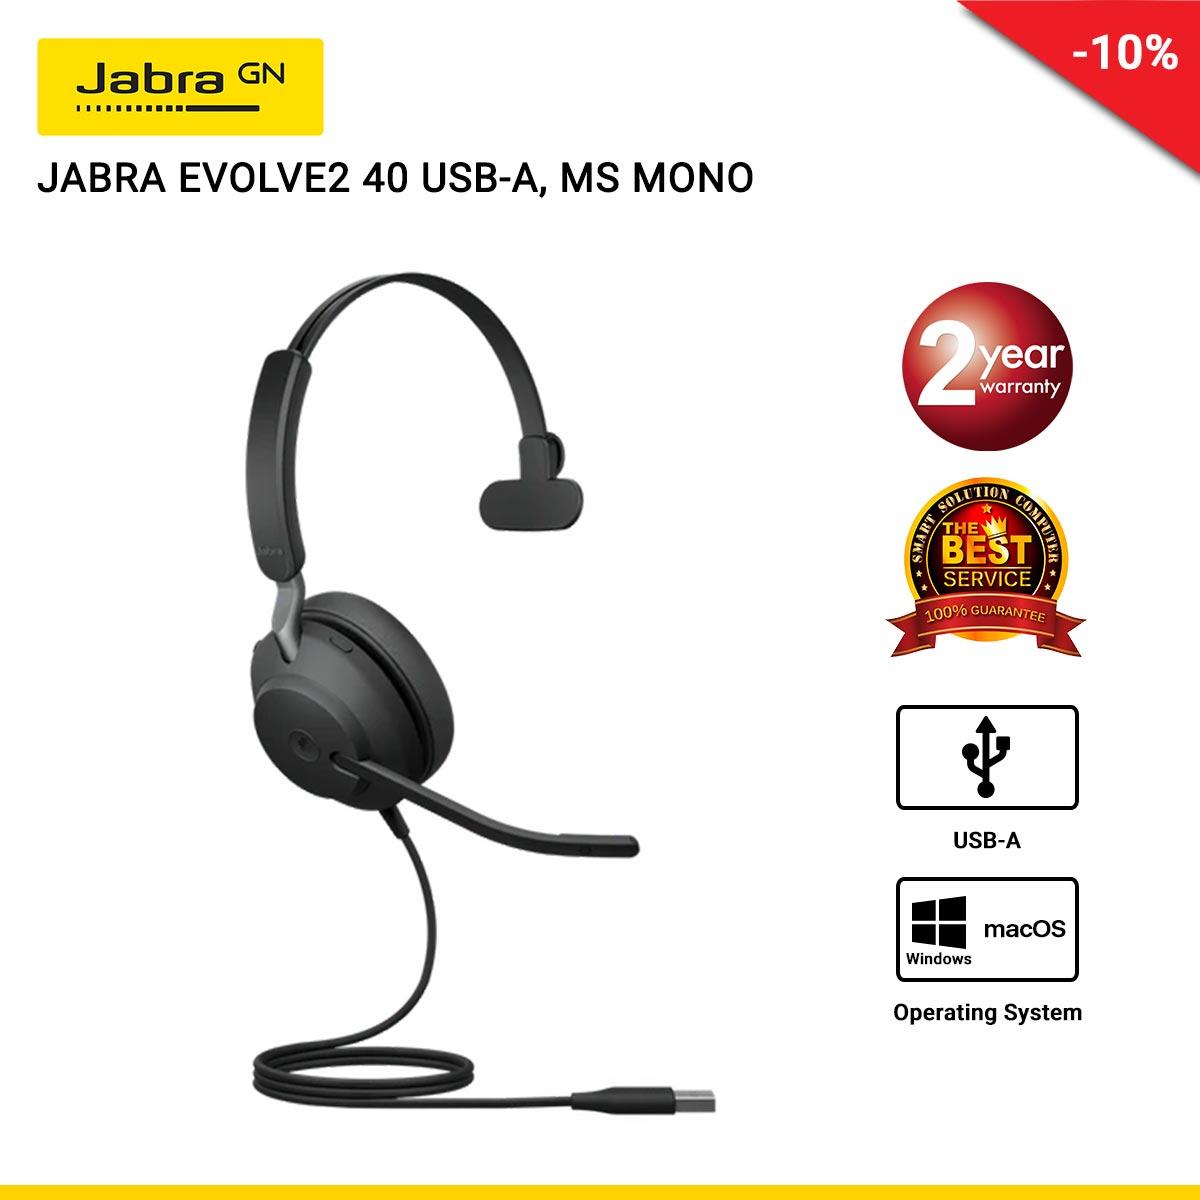 JABRA EVOLVE2 40 USB-A, MS MONO (JBA-24089-899-999)